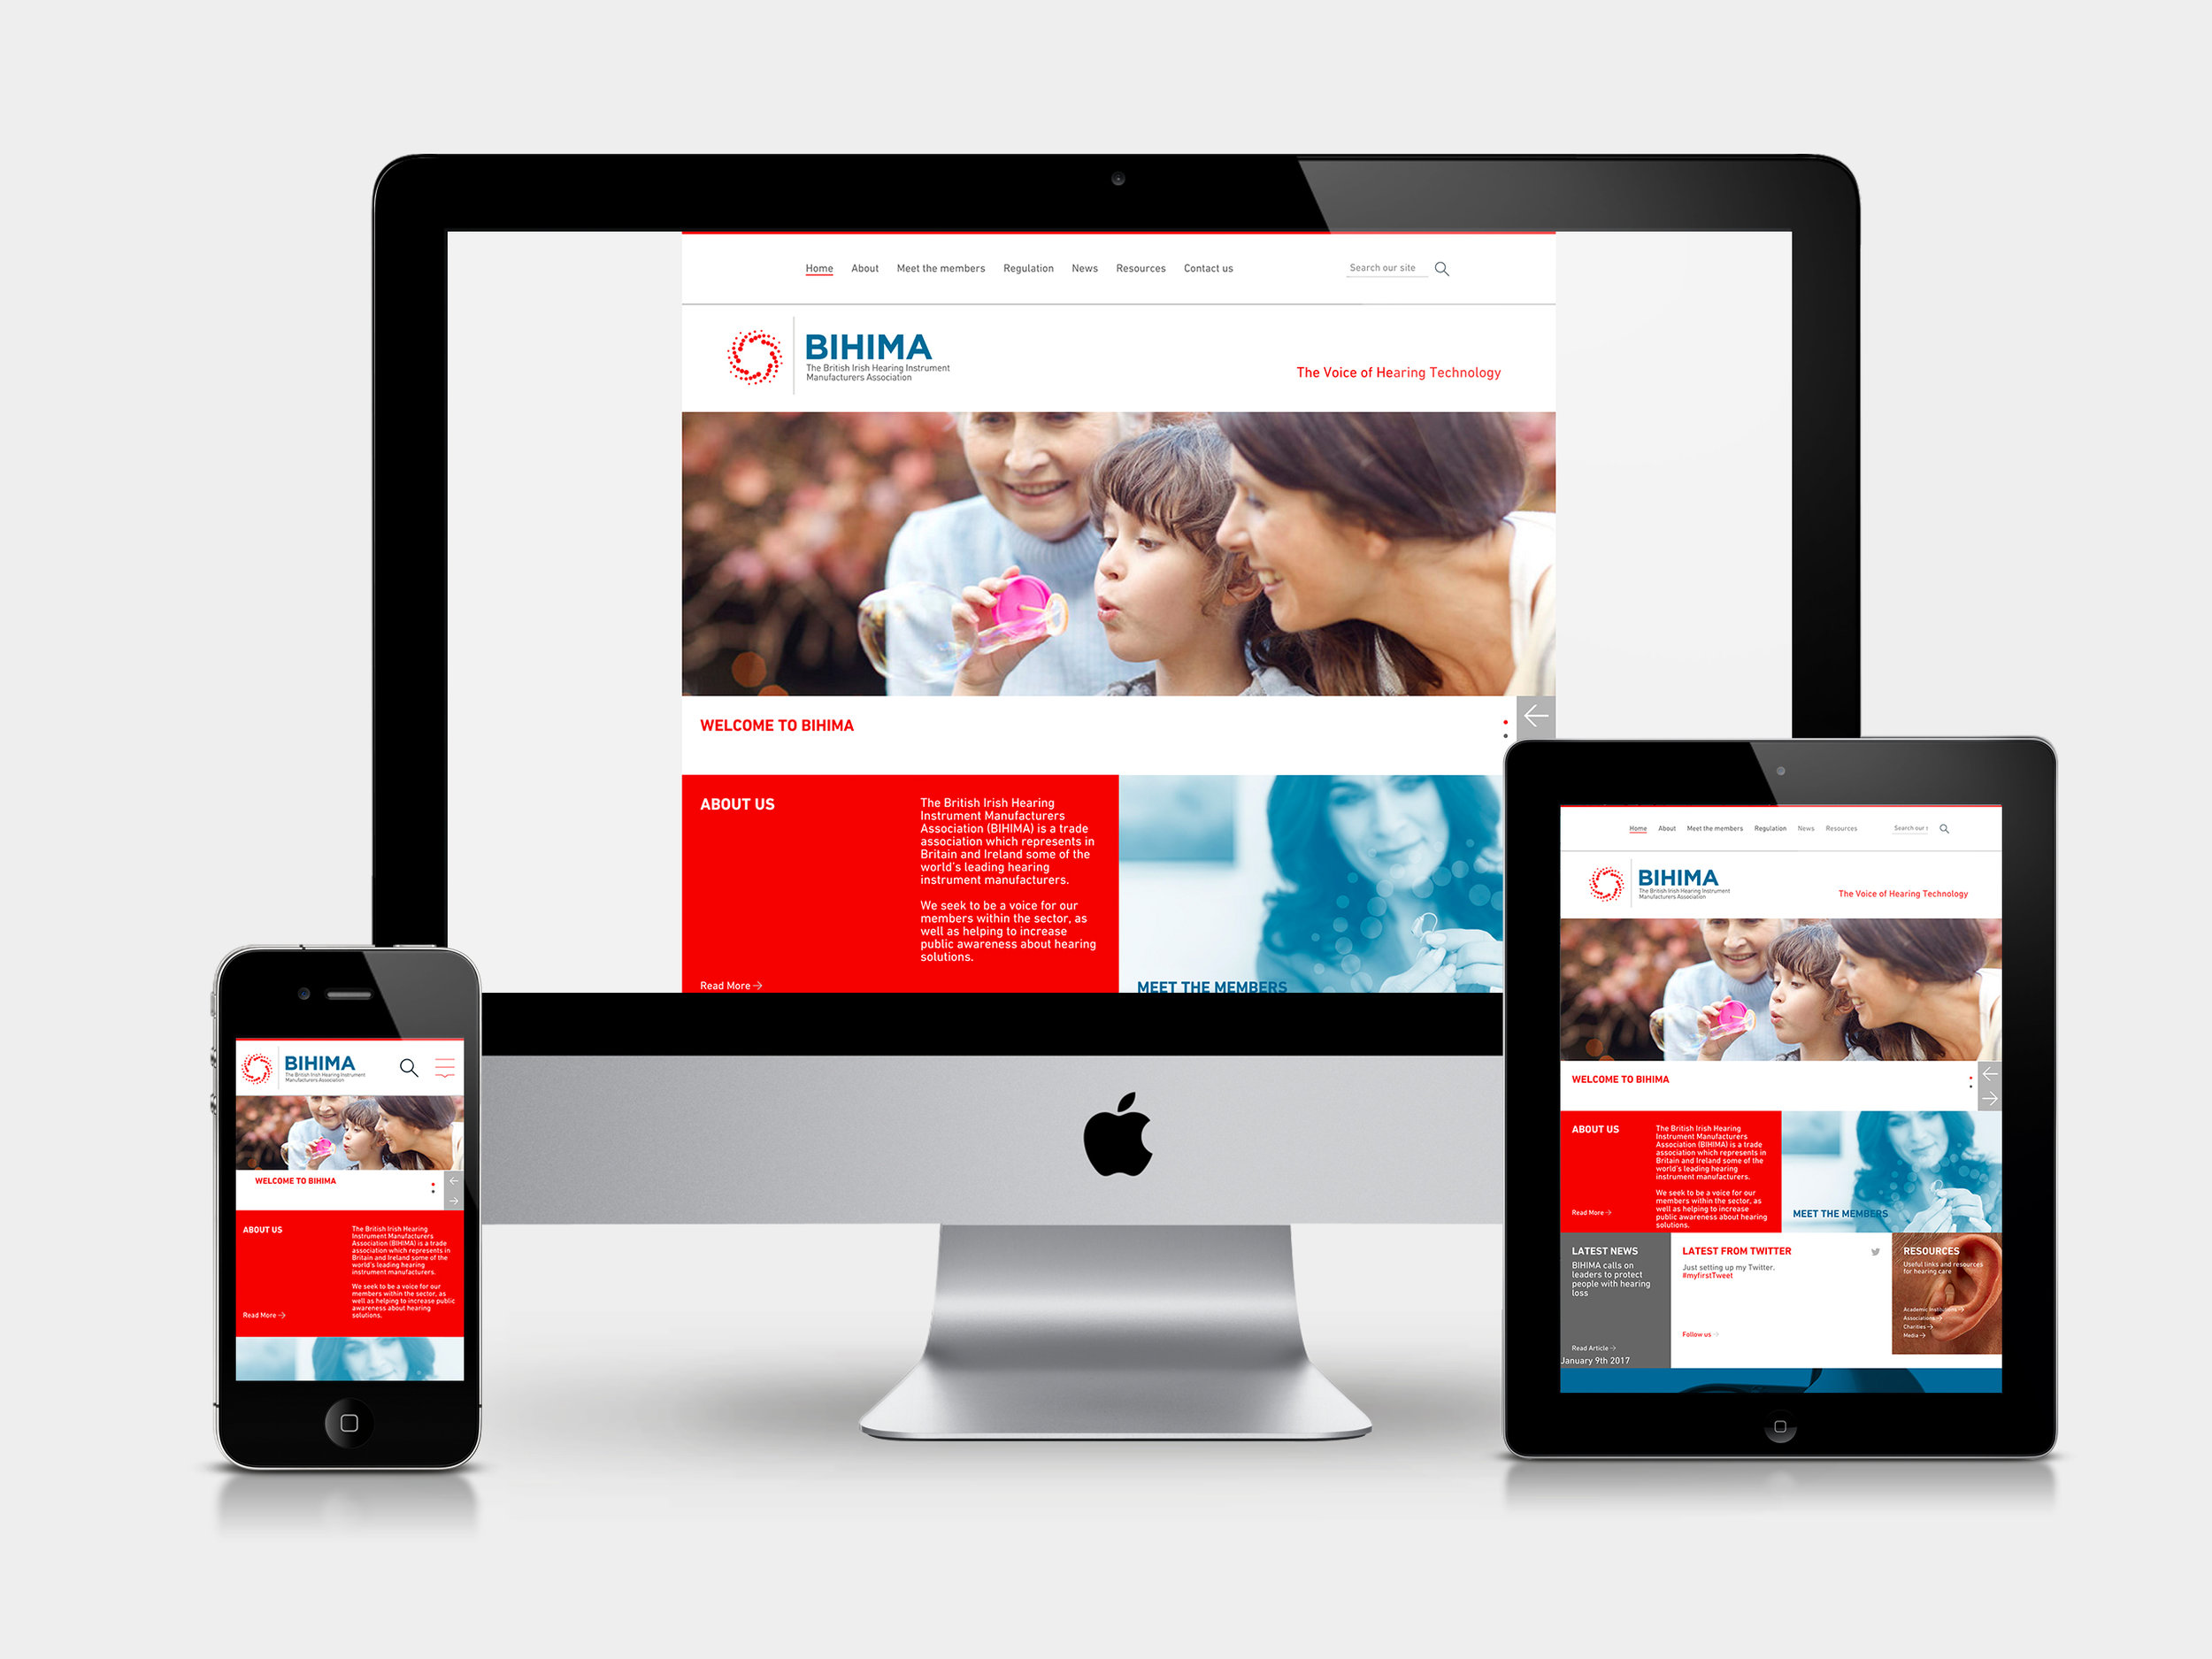 bihima_website.jpg